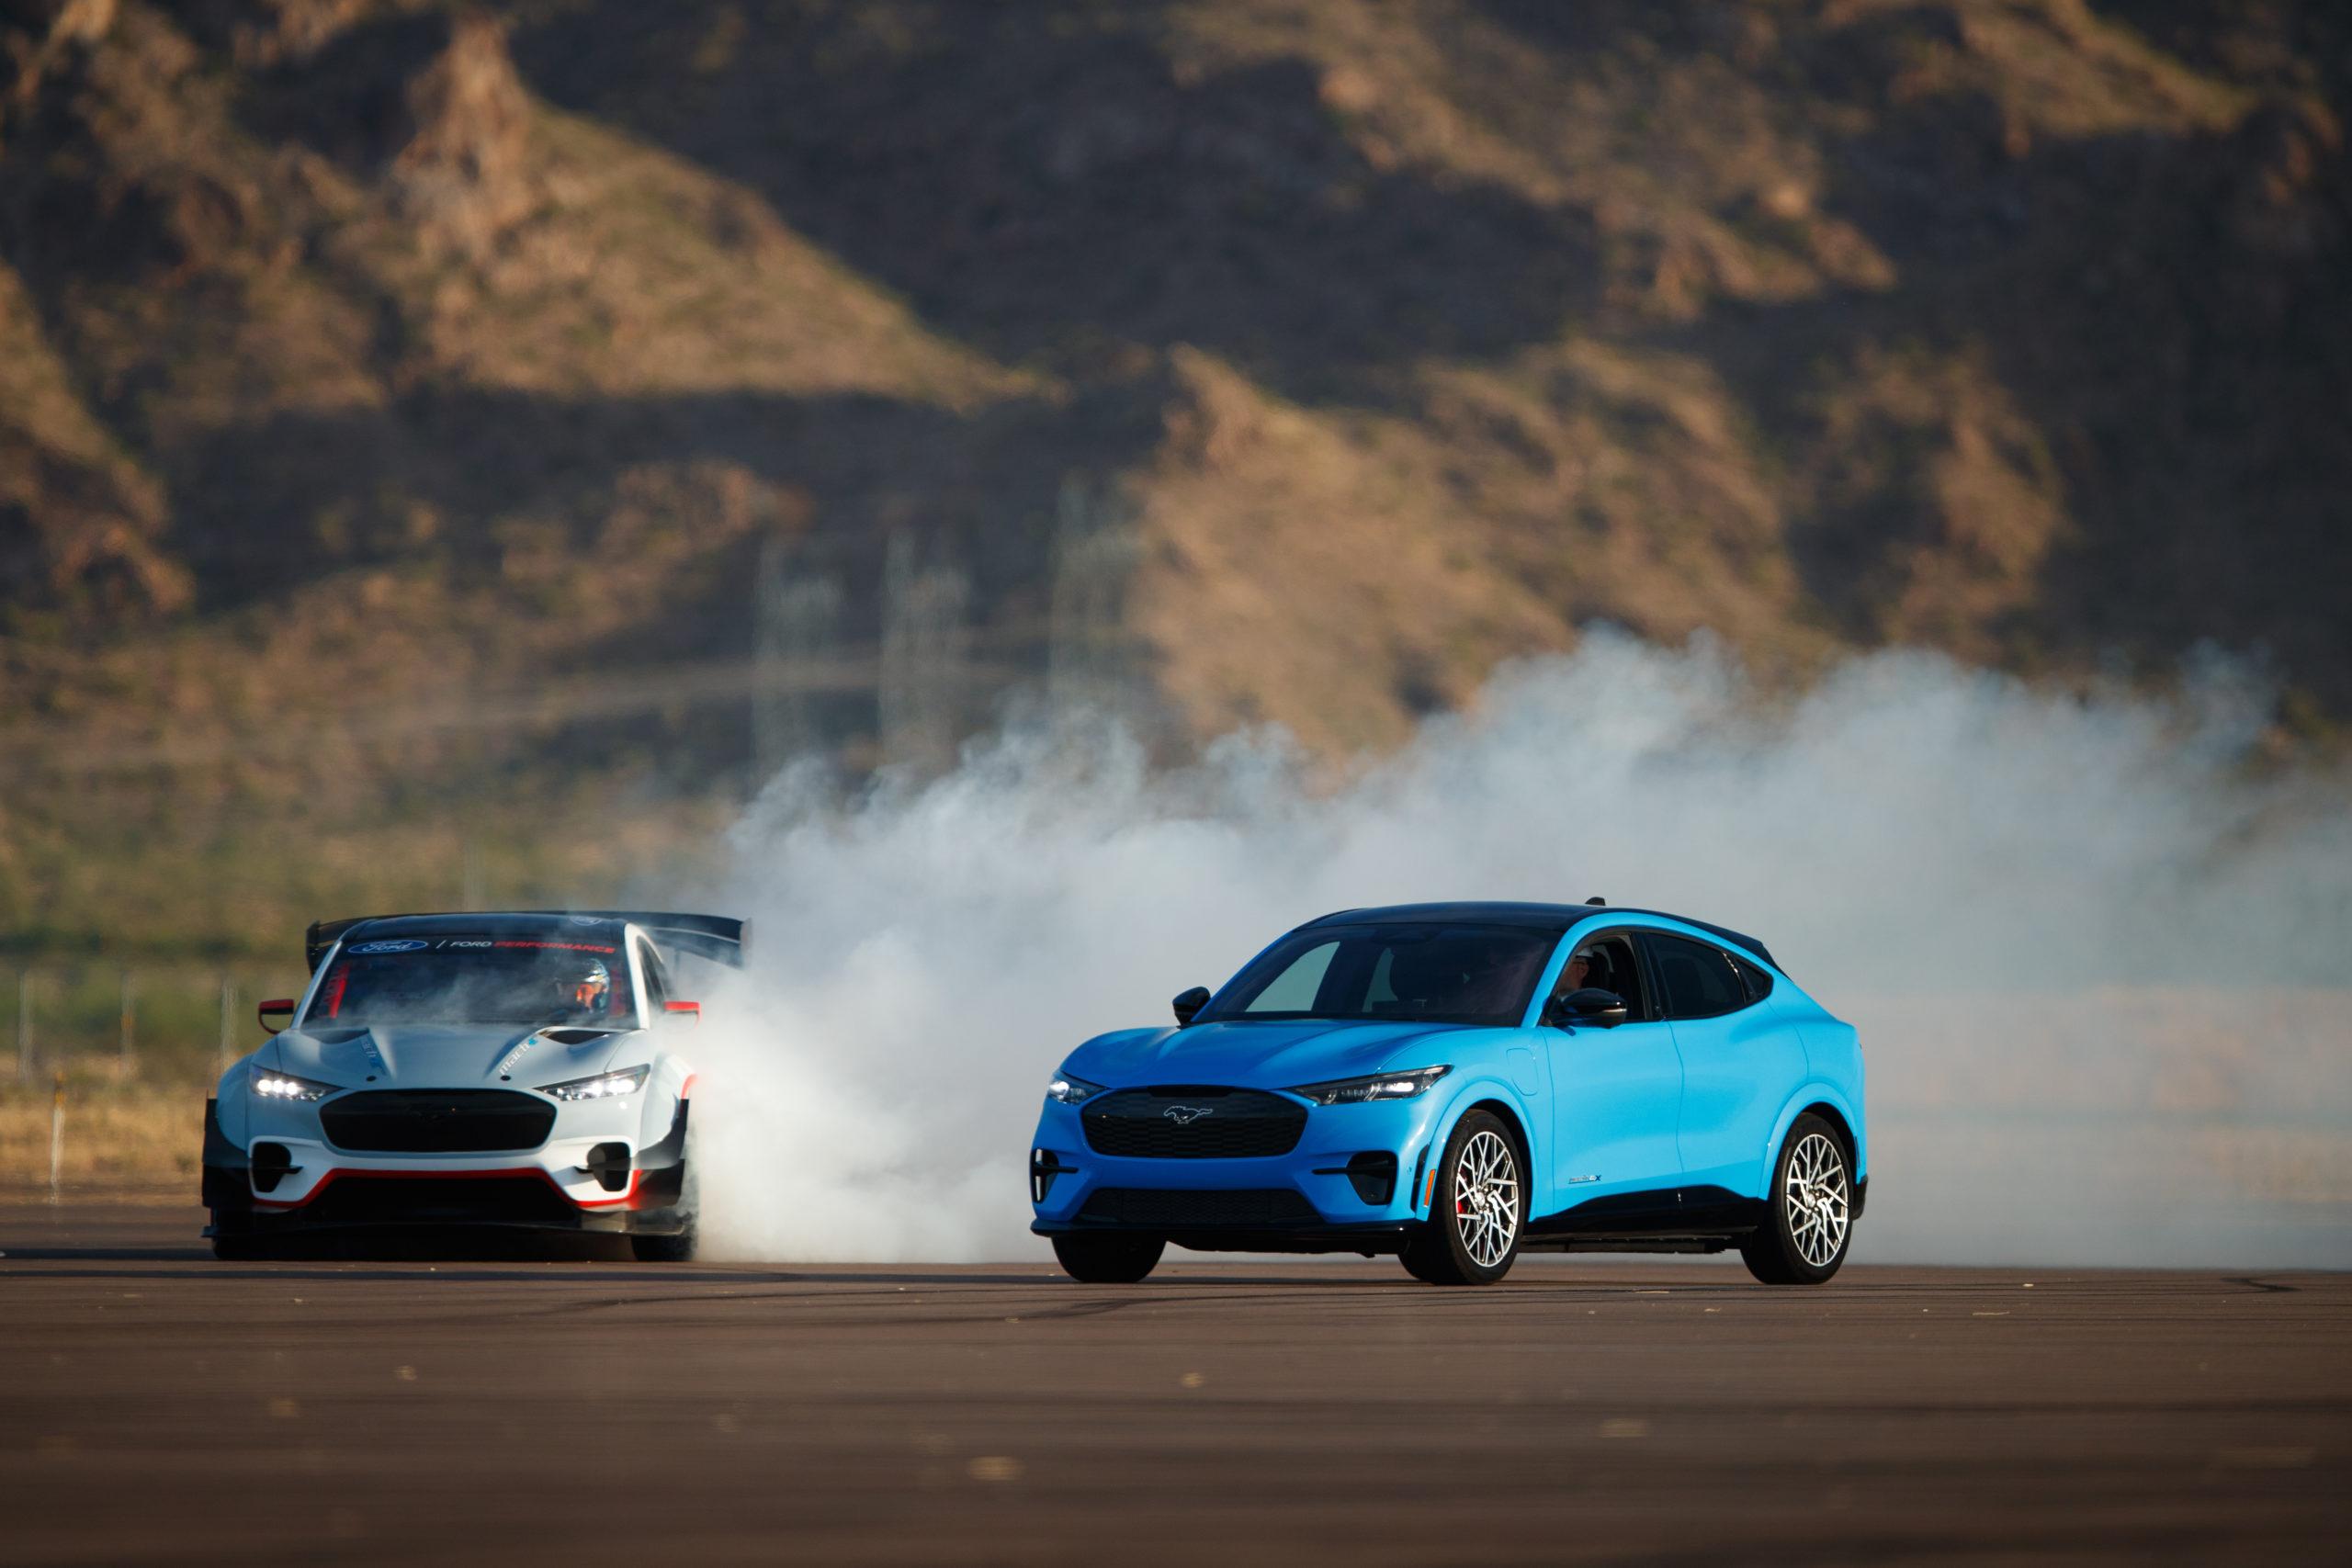 Mustang Mach-E sladdar